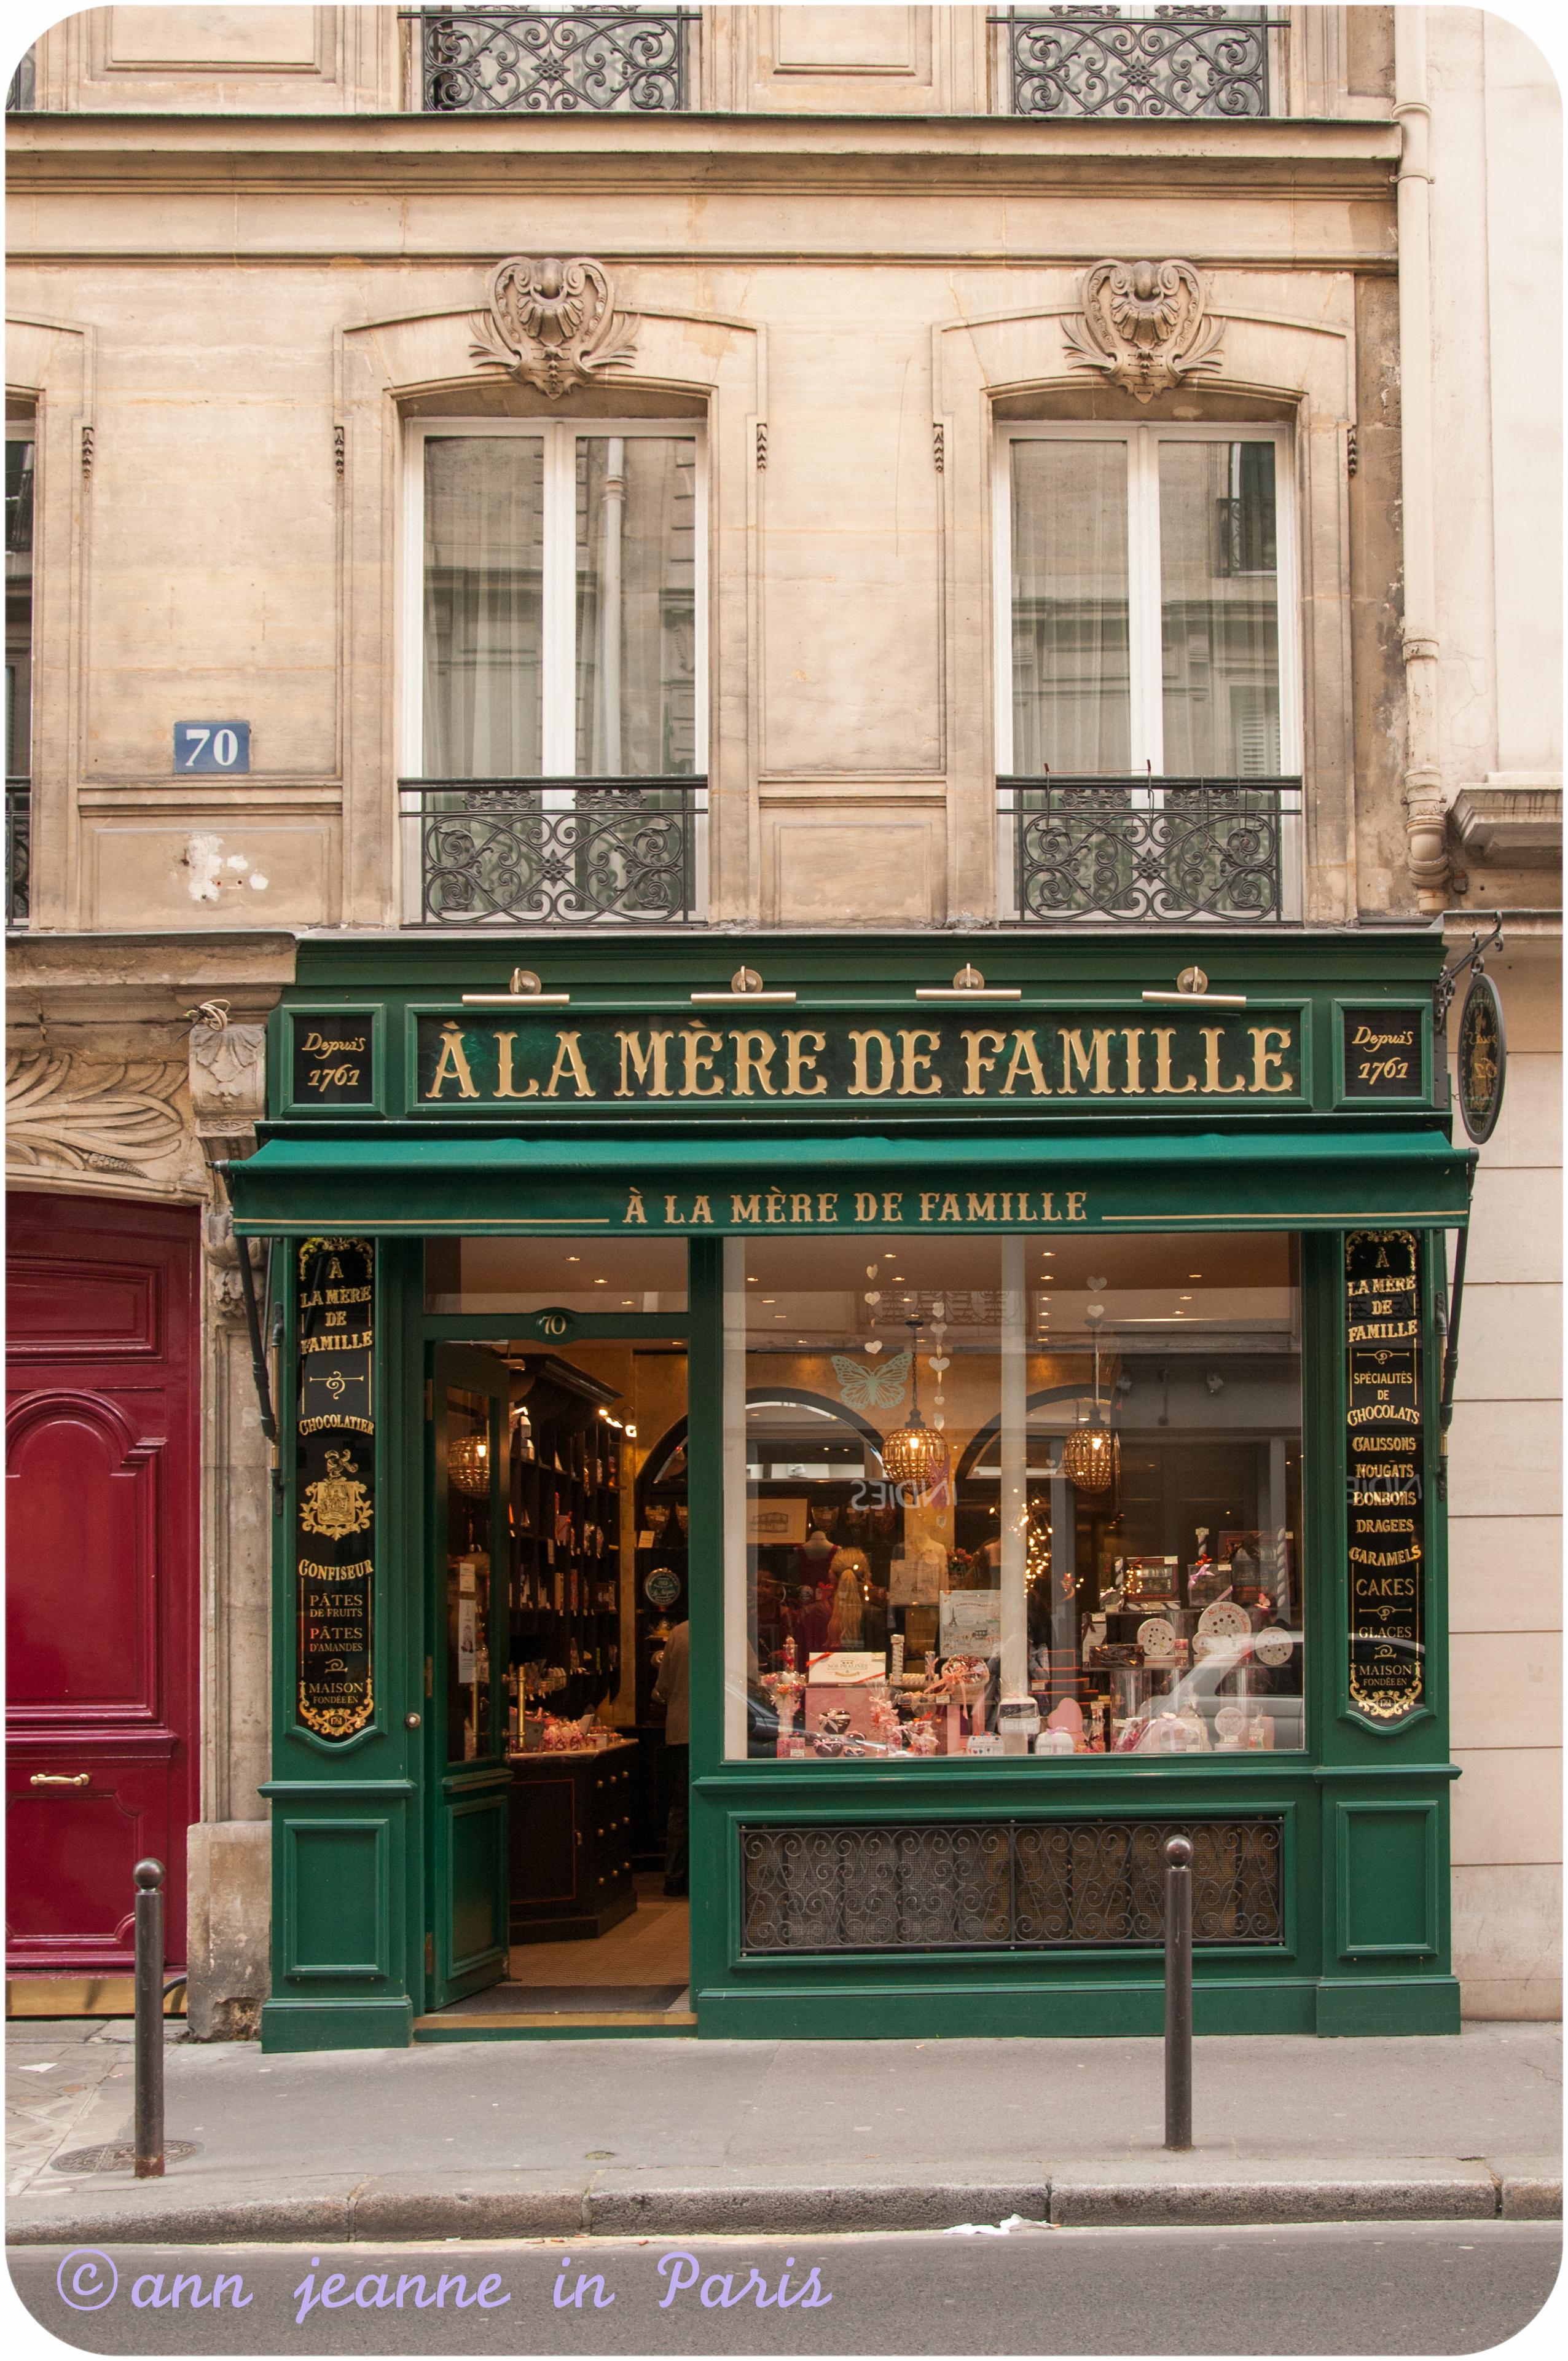 A La Mère de Famille - 70 rue Bonaparte